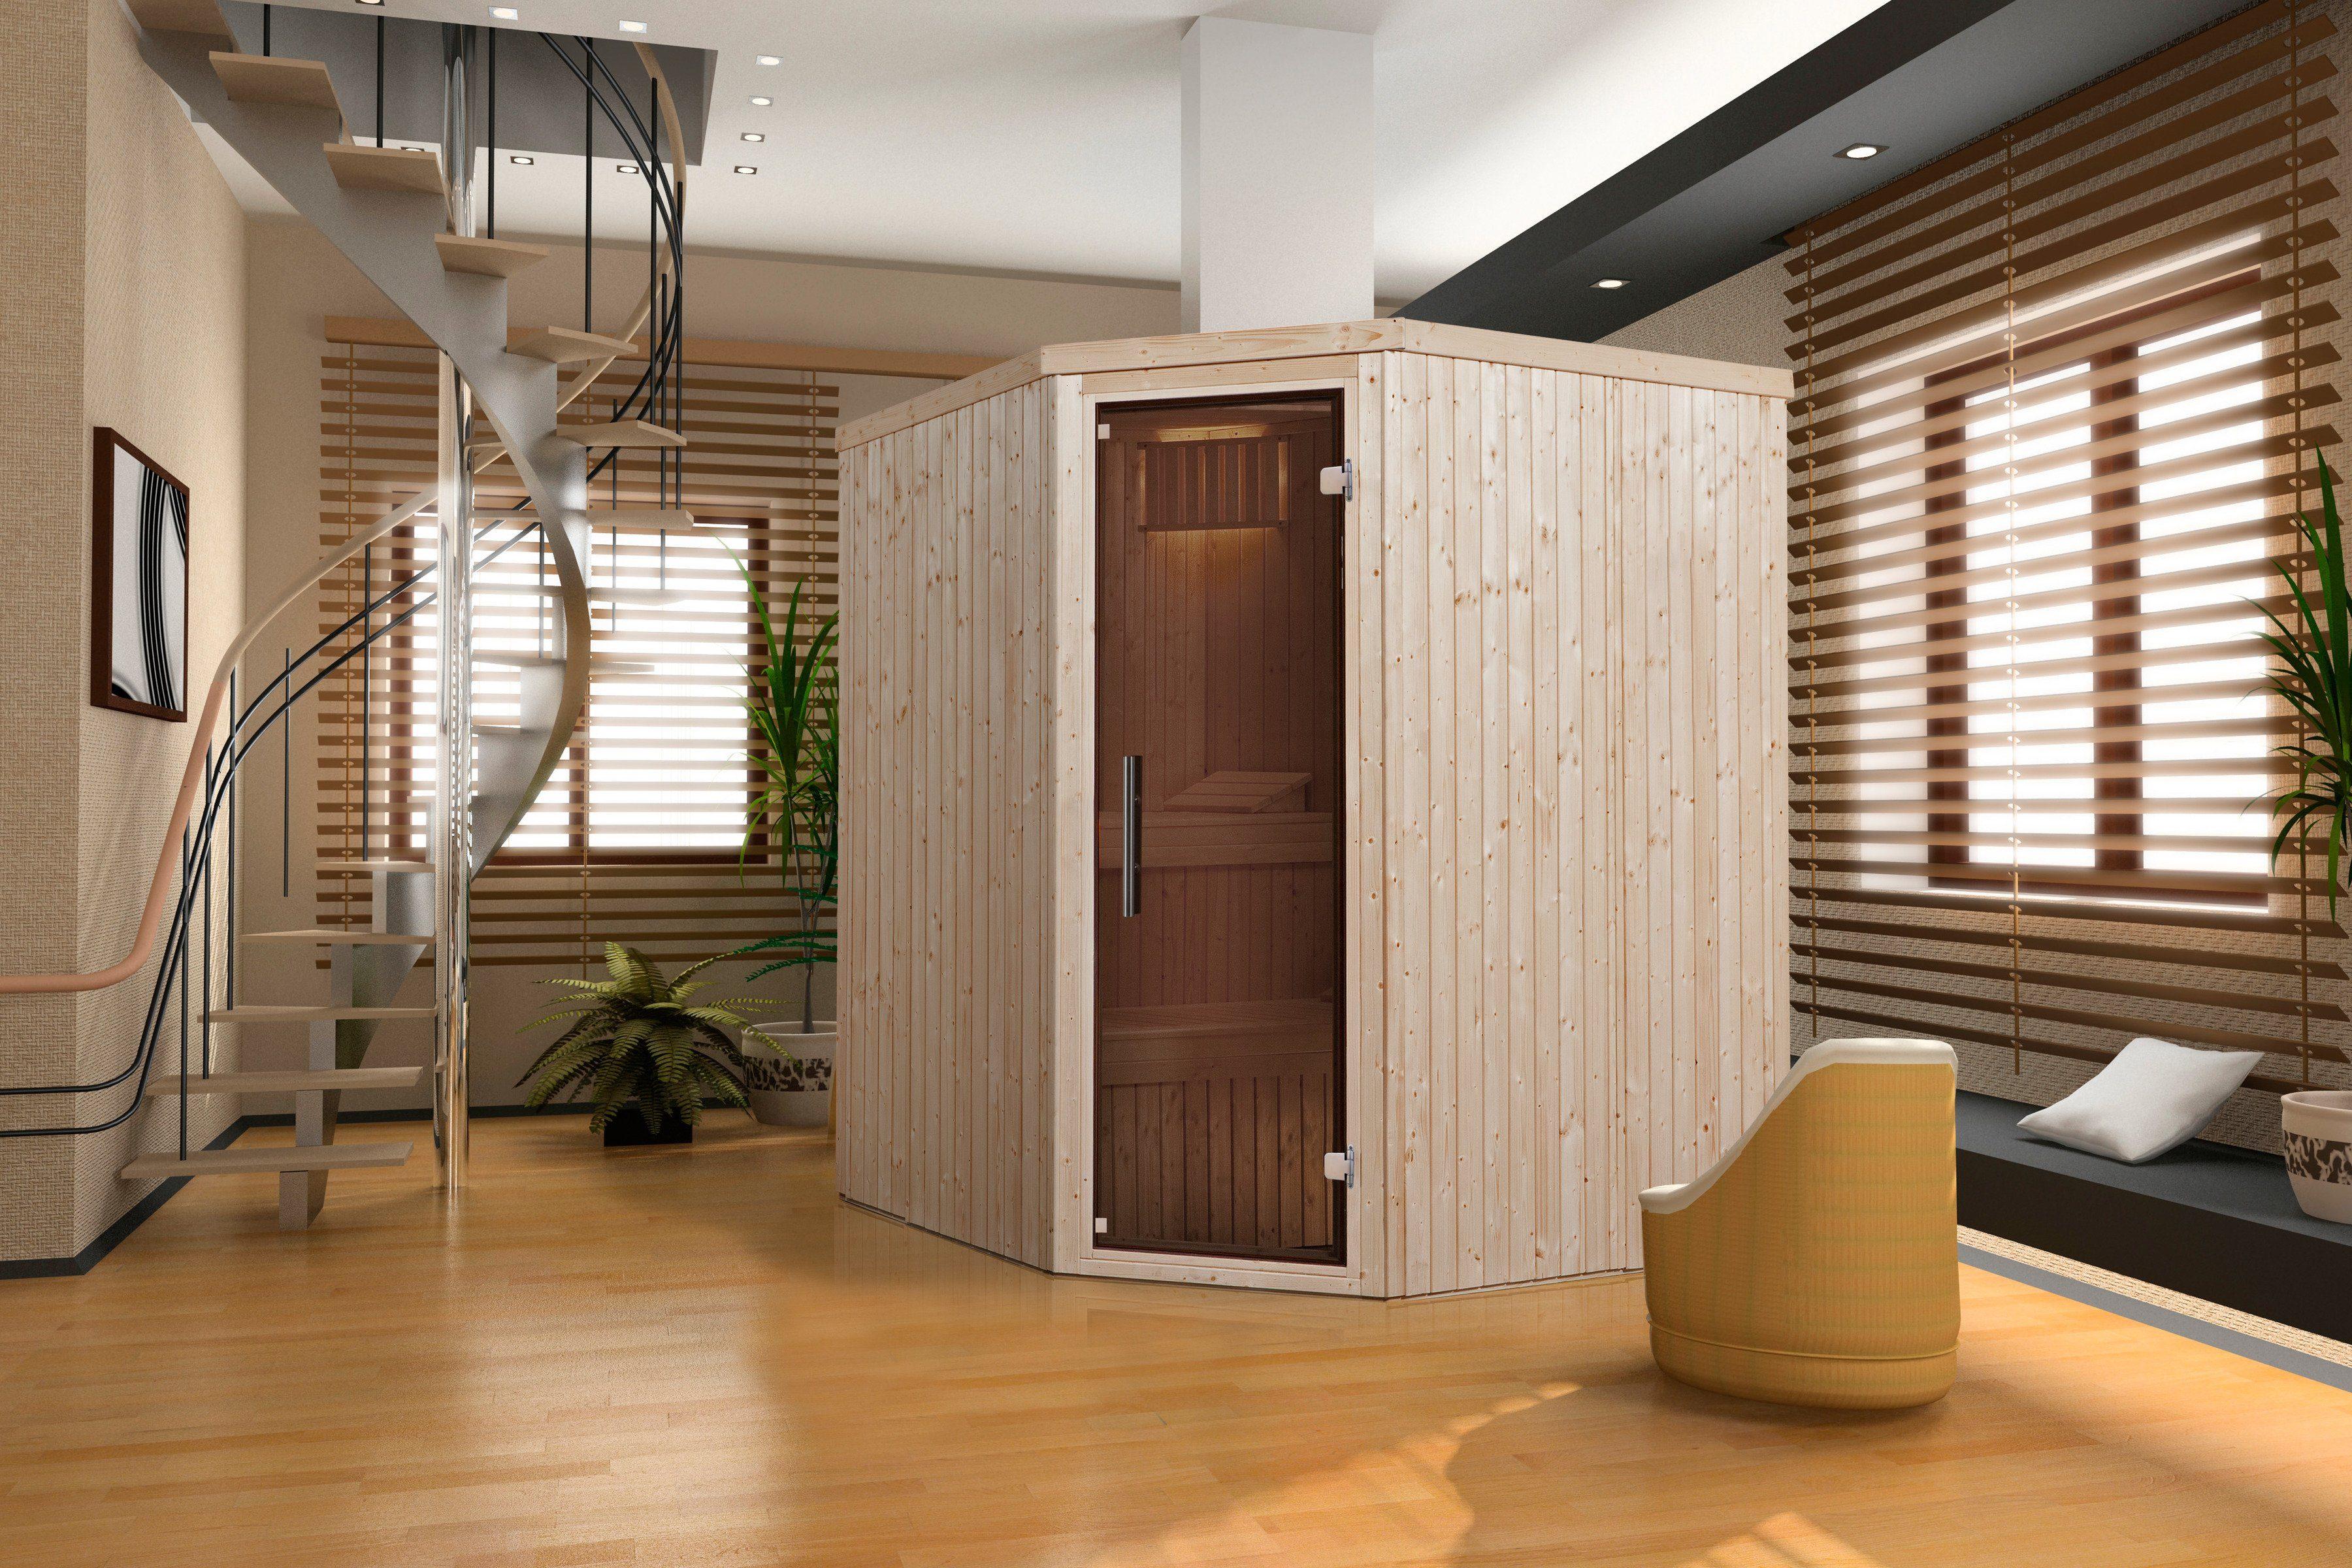 Weka Sauna »Lyngdal 3 Trend Plus Kompakt«, 192/175/199 cm, 68 mm, 8-KW-Ofen